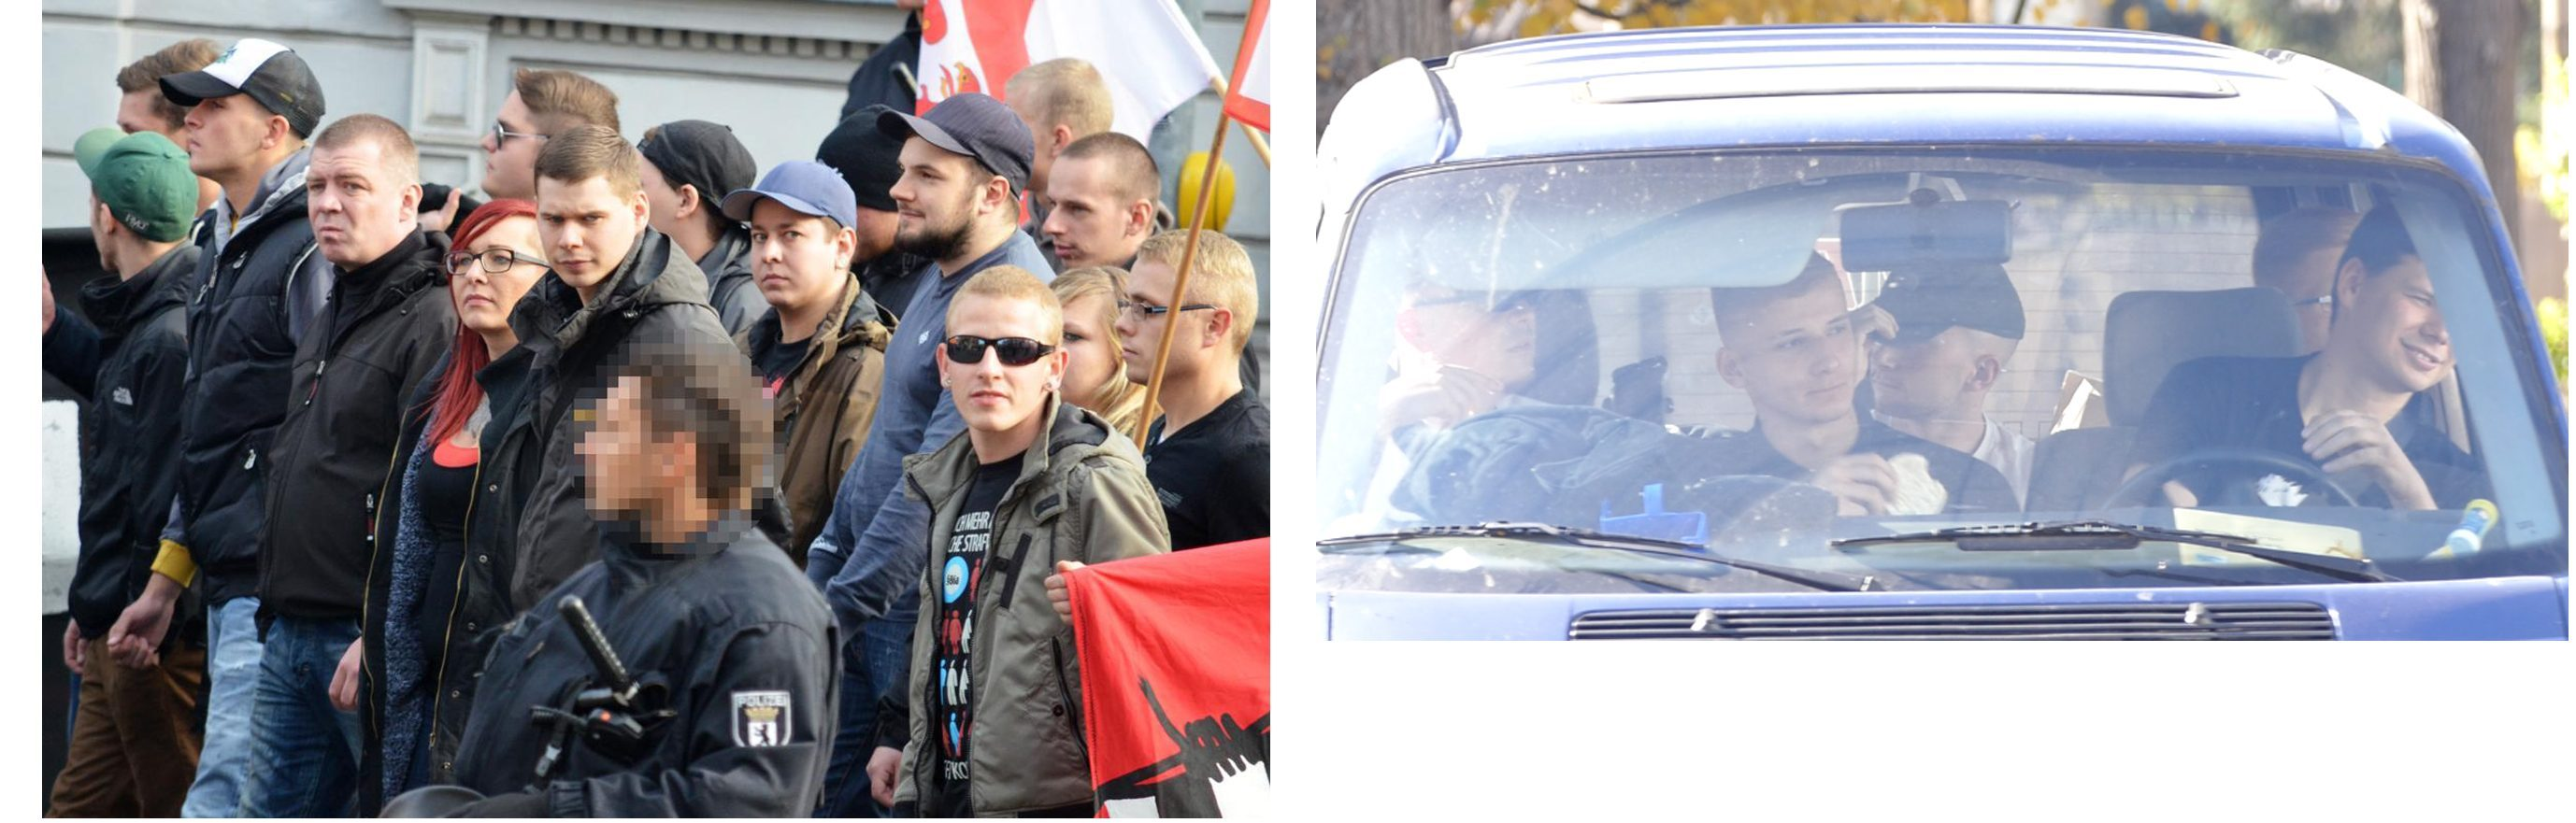 Links: Robert Andres bei einem JN-Aufmarsch 2013 in Döbeln (Quelle: Pixelarchiv) Rechts: Robert Andres als Fahrer des Tiwaz-Teams am 18.10.18 in Ostritz. Vom Betrachter aus hinten links: Eric Fröhlich, rechts Max Hetzner